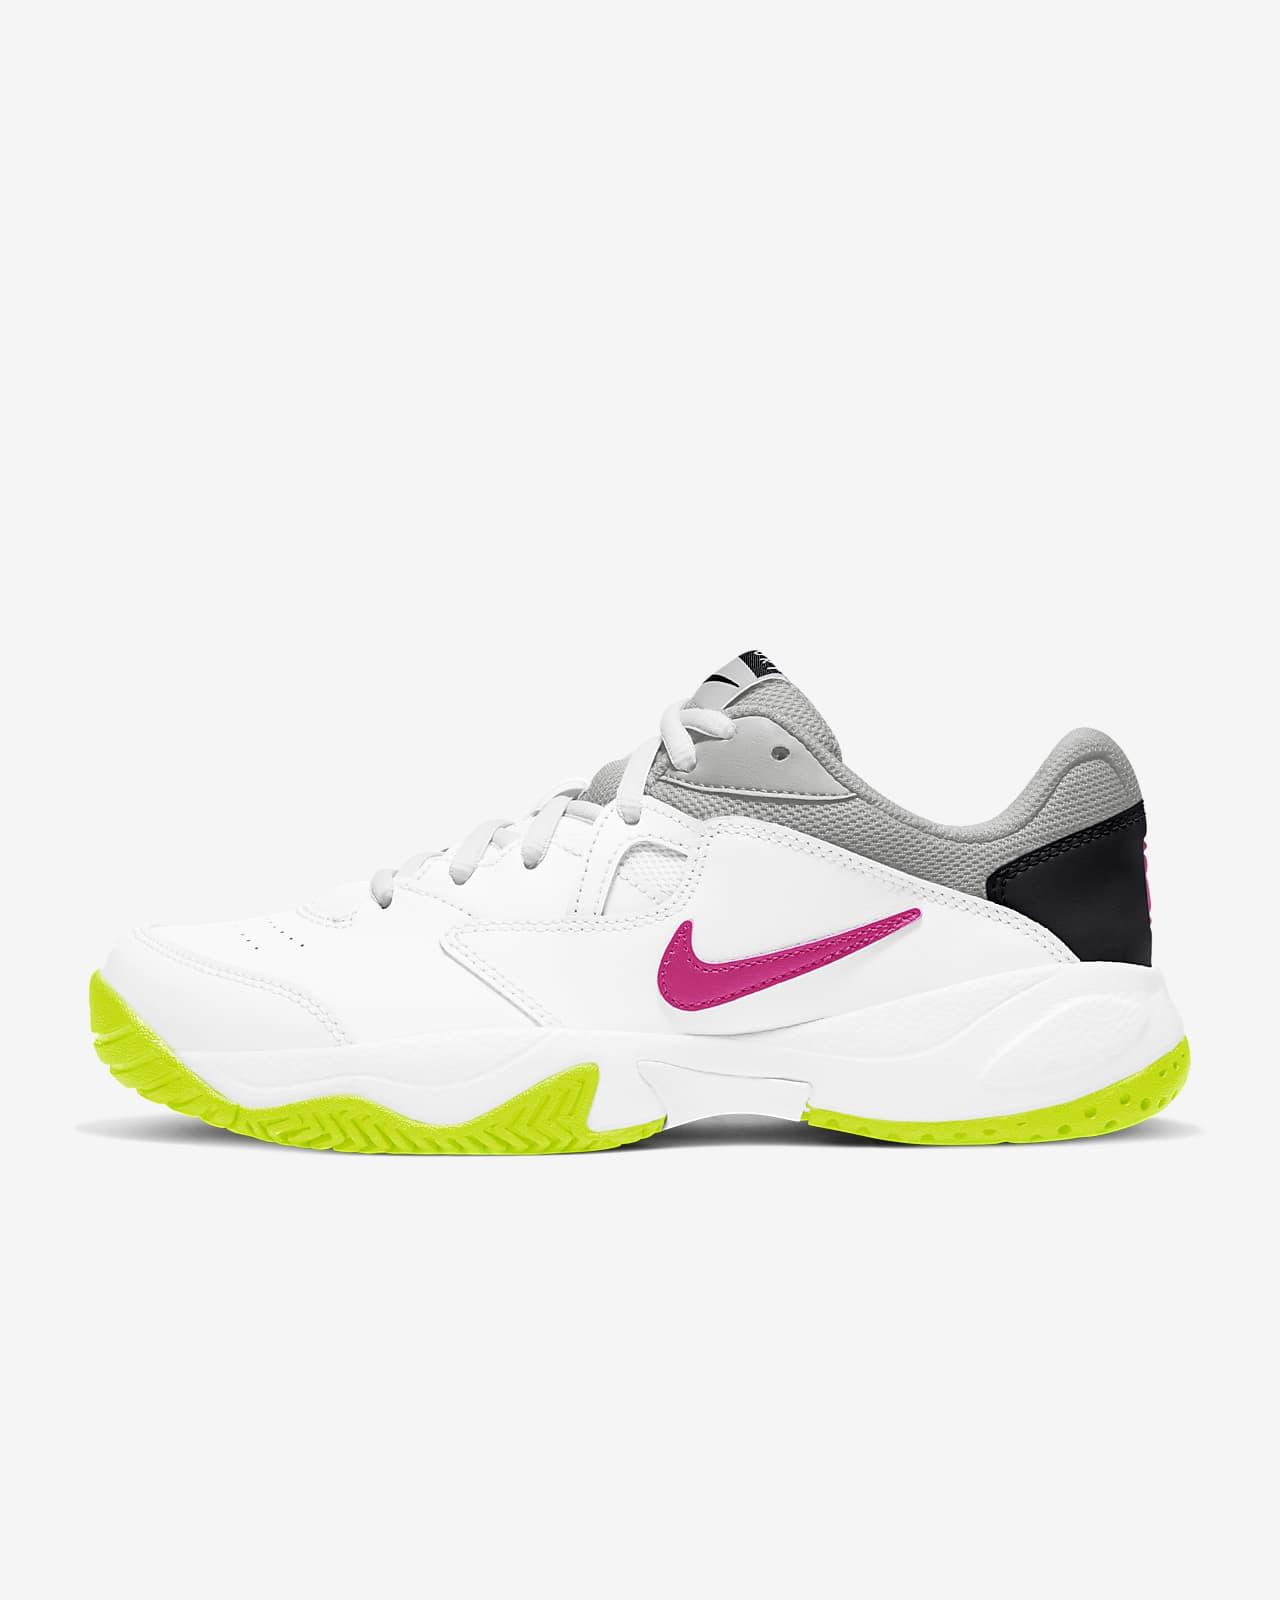 Nike Court Lite 2 女子硬地球场网球鞋-耐